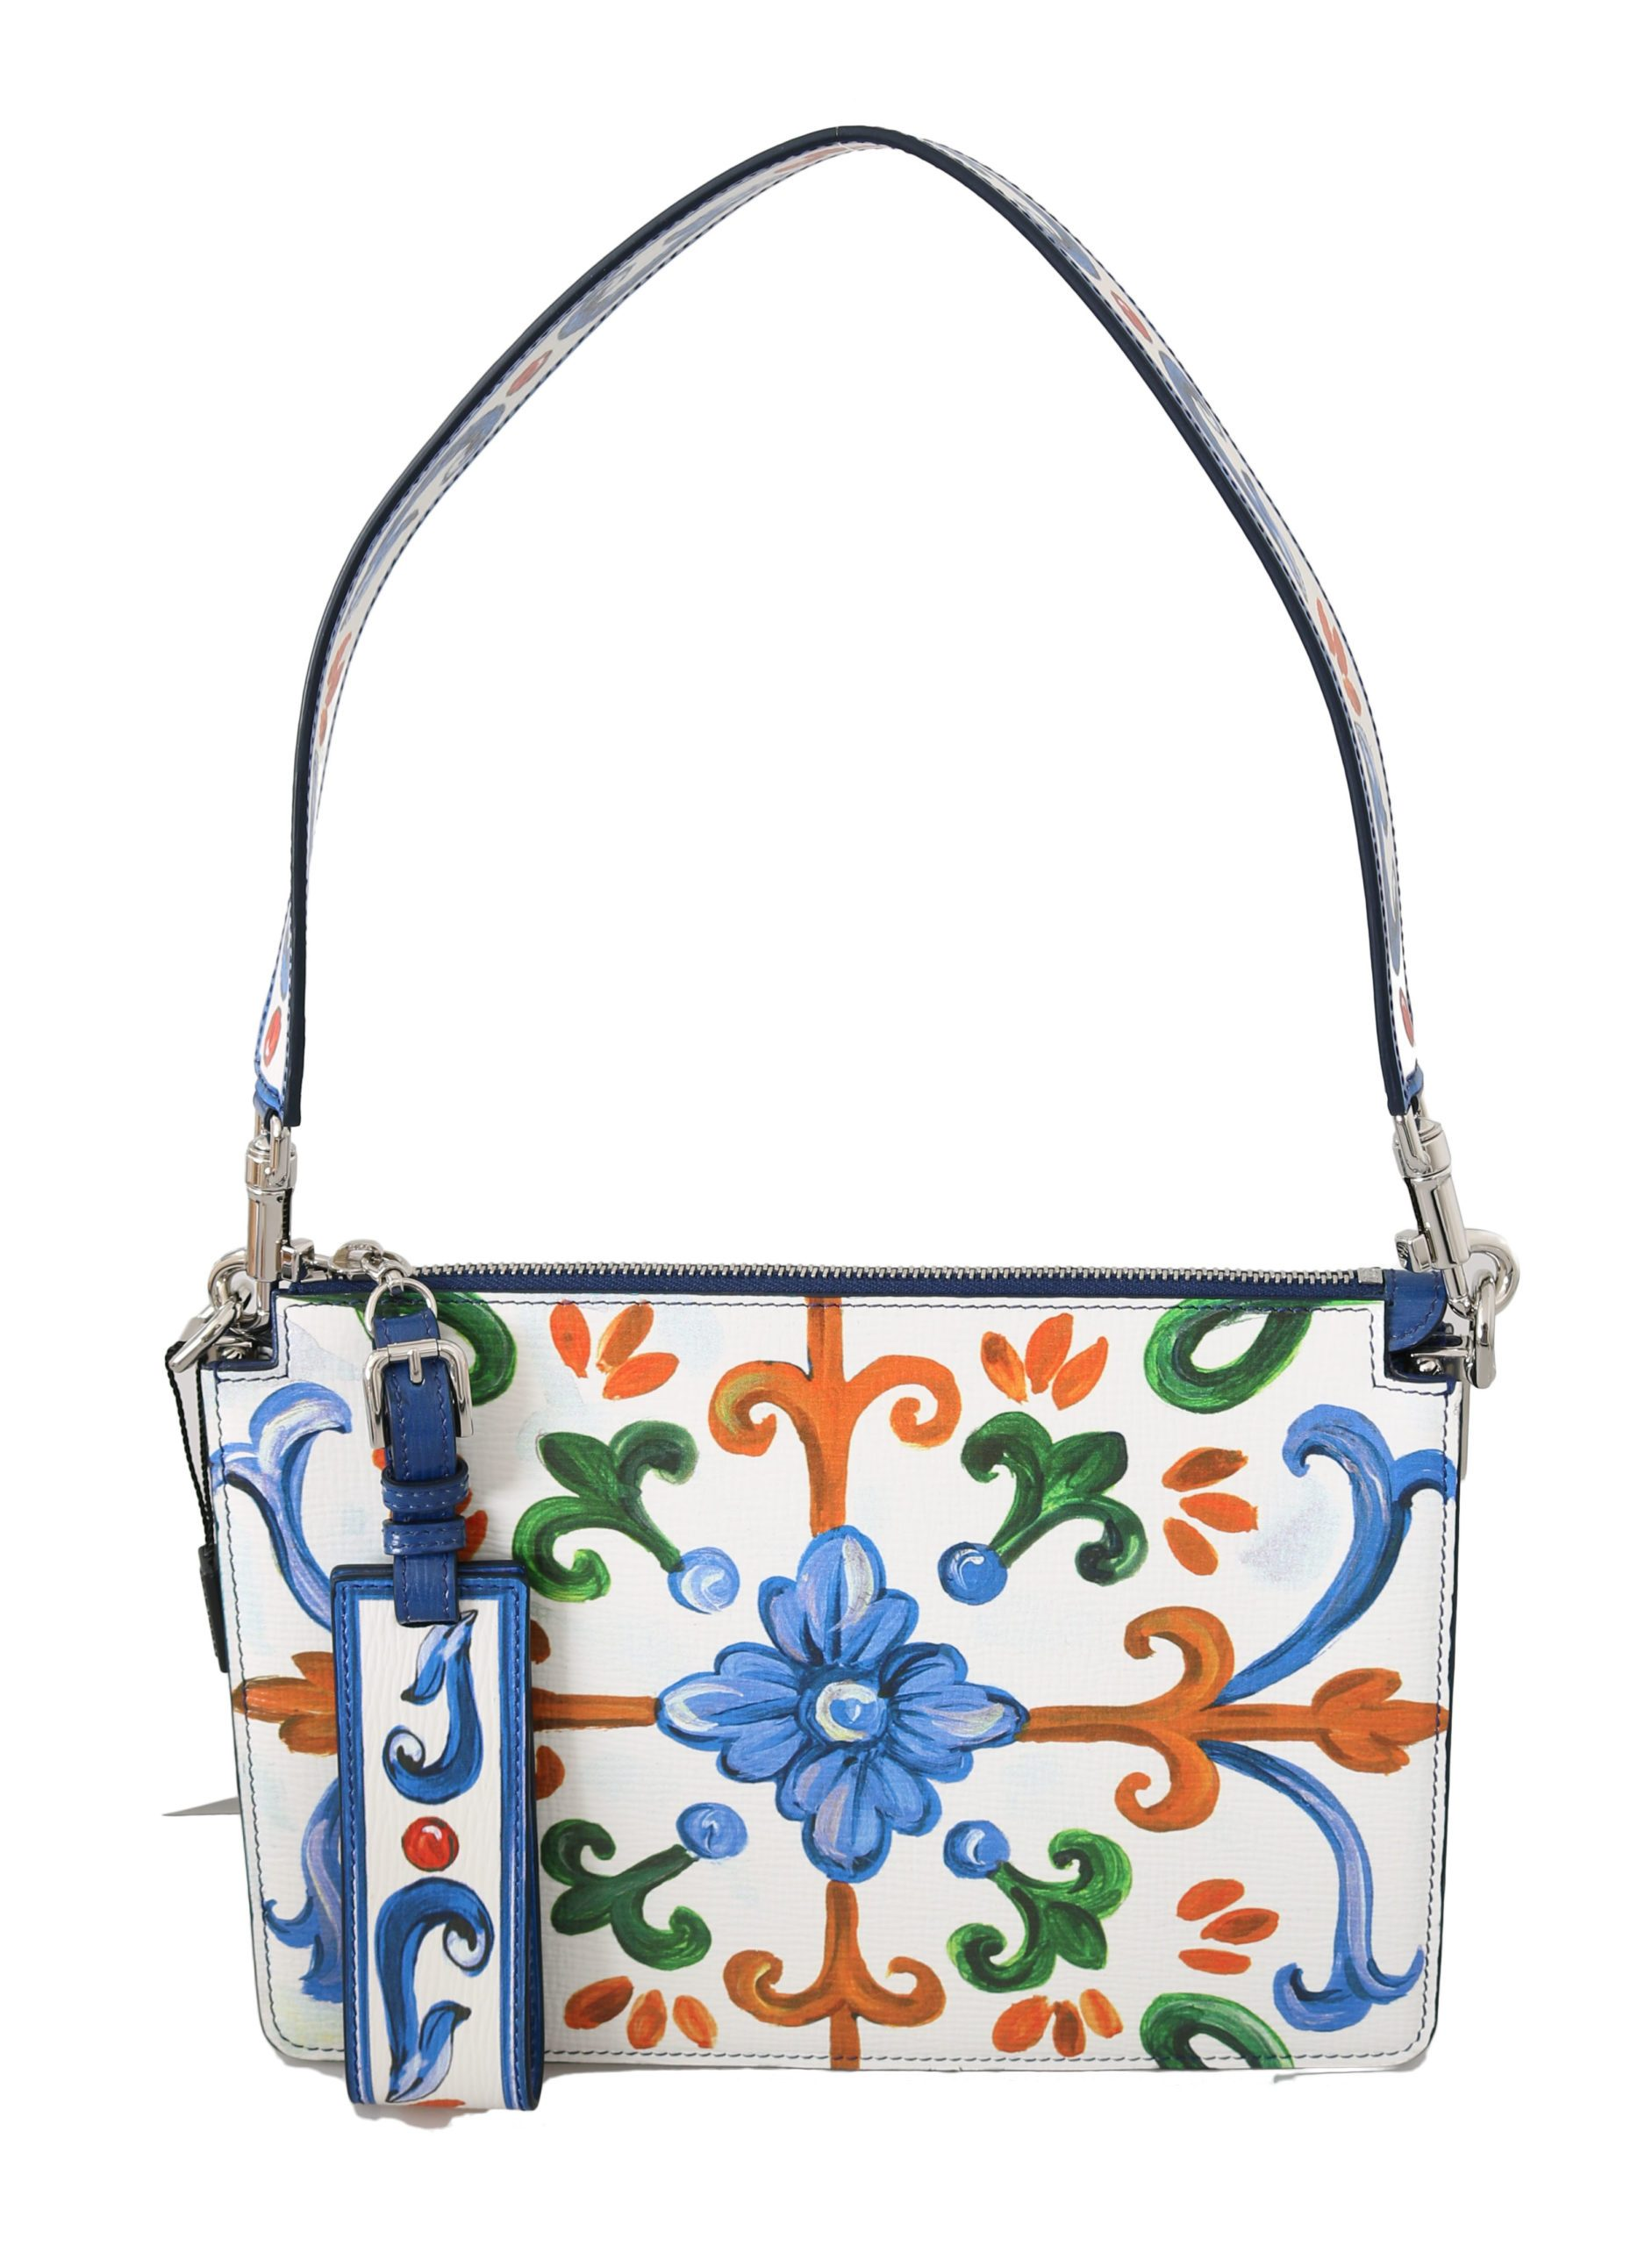 Dolce & Gabbana Women's Majolica Book Leather Shoulder Bag White VAS8766